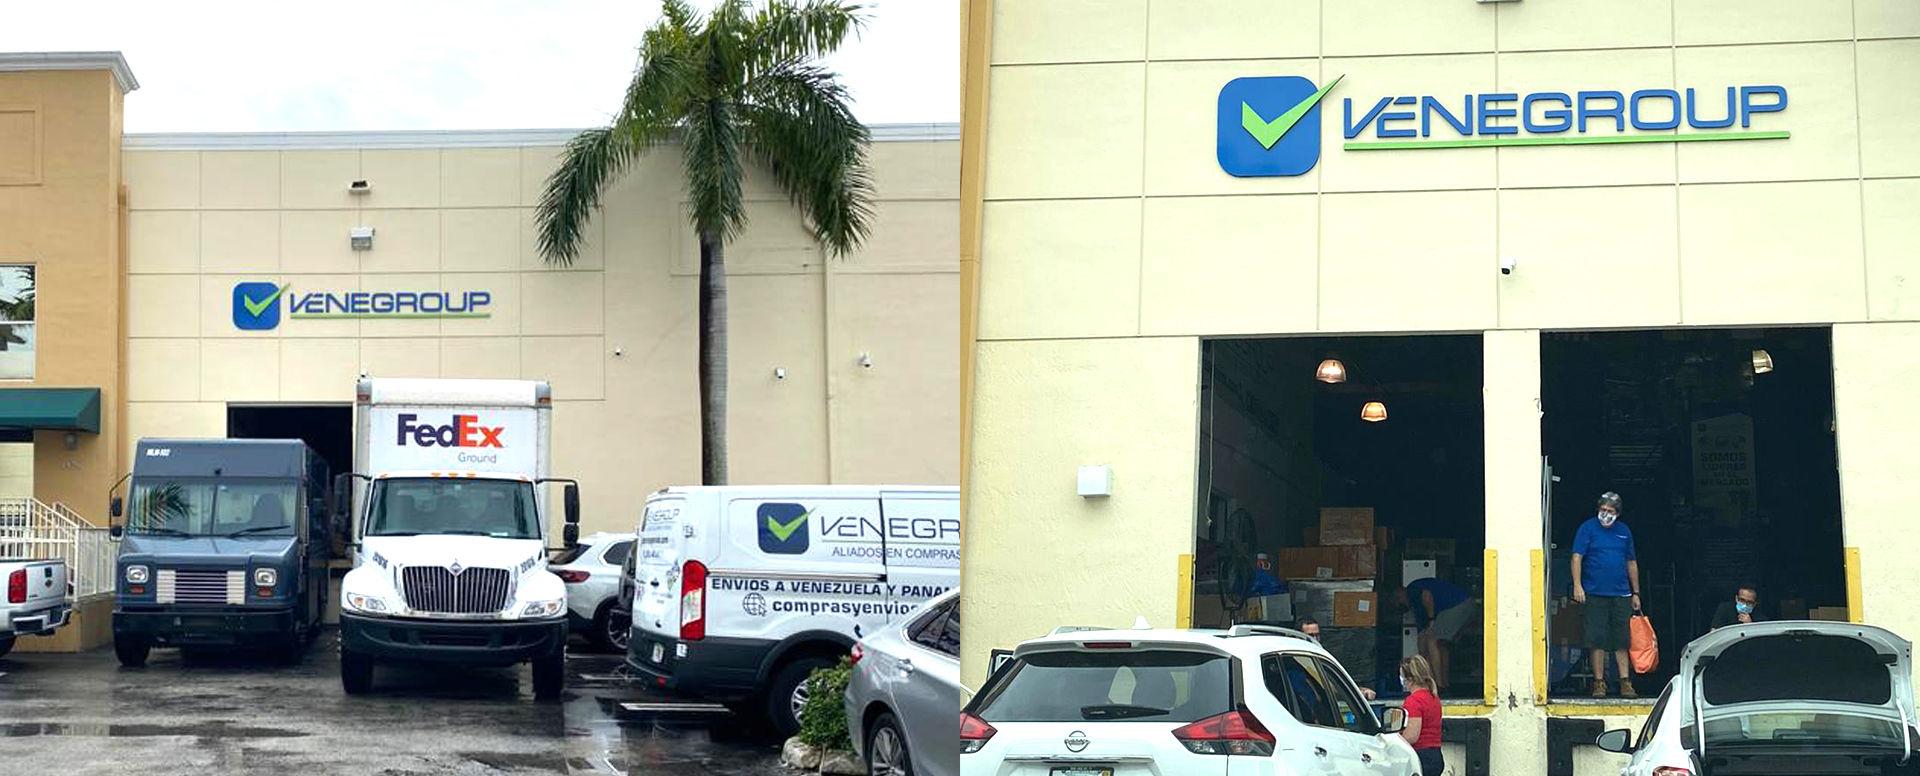 Recepción de Mercancía en Miami - Venegroup Services